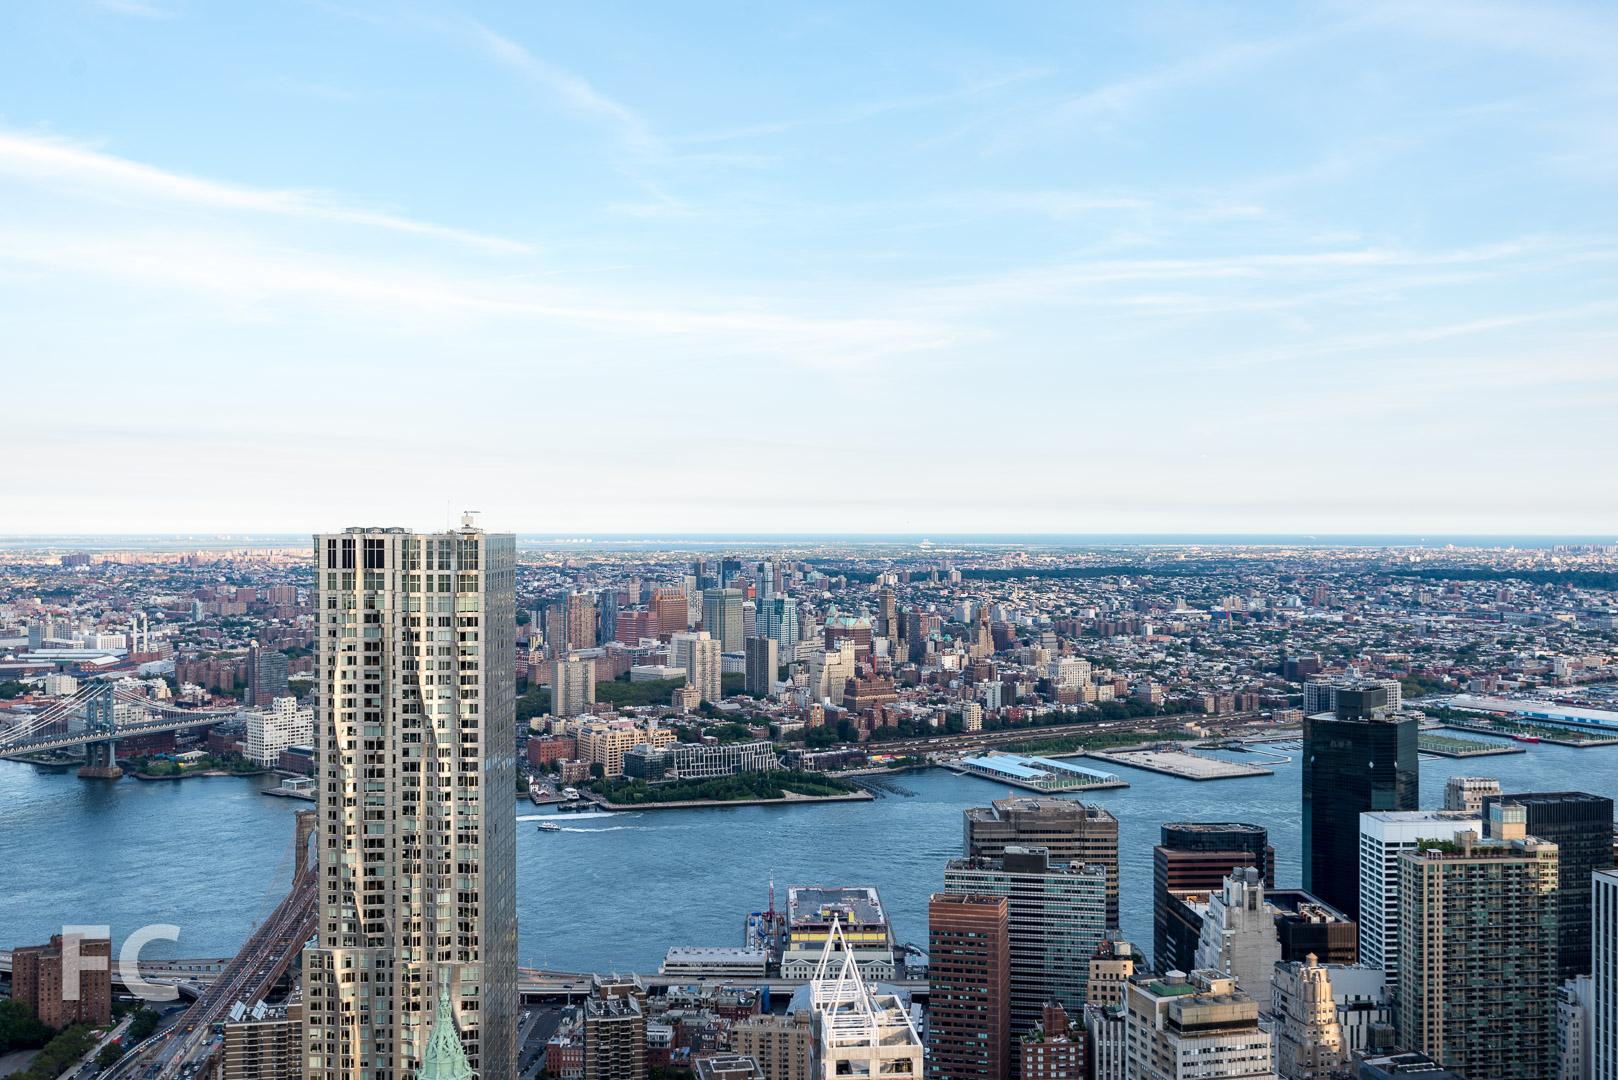 The Lower Manhattan skyline with Brooklyn Bridge Park and the Downtown Brooklyn skyline in the background.